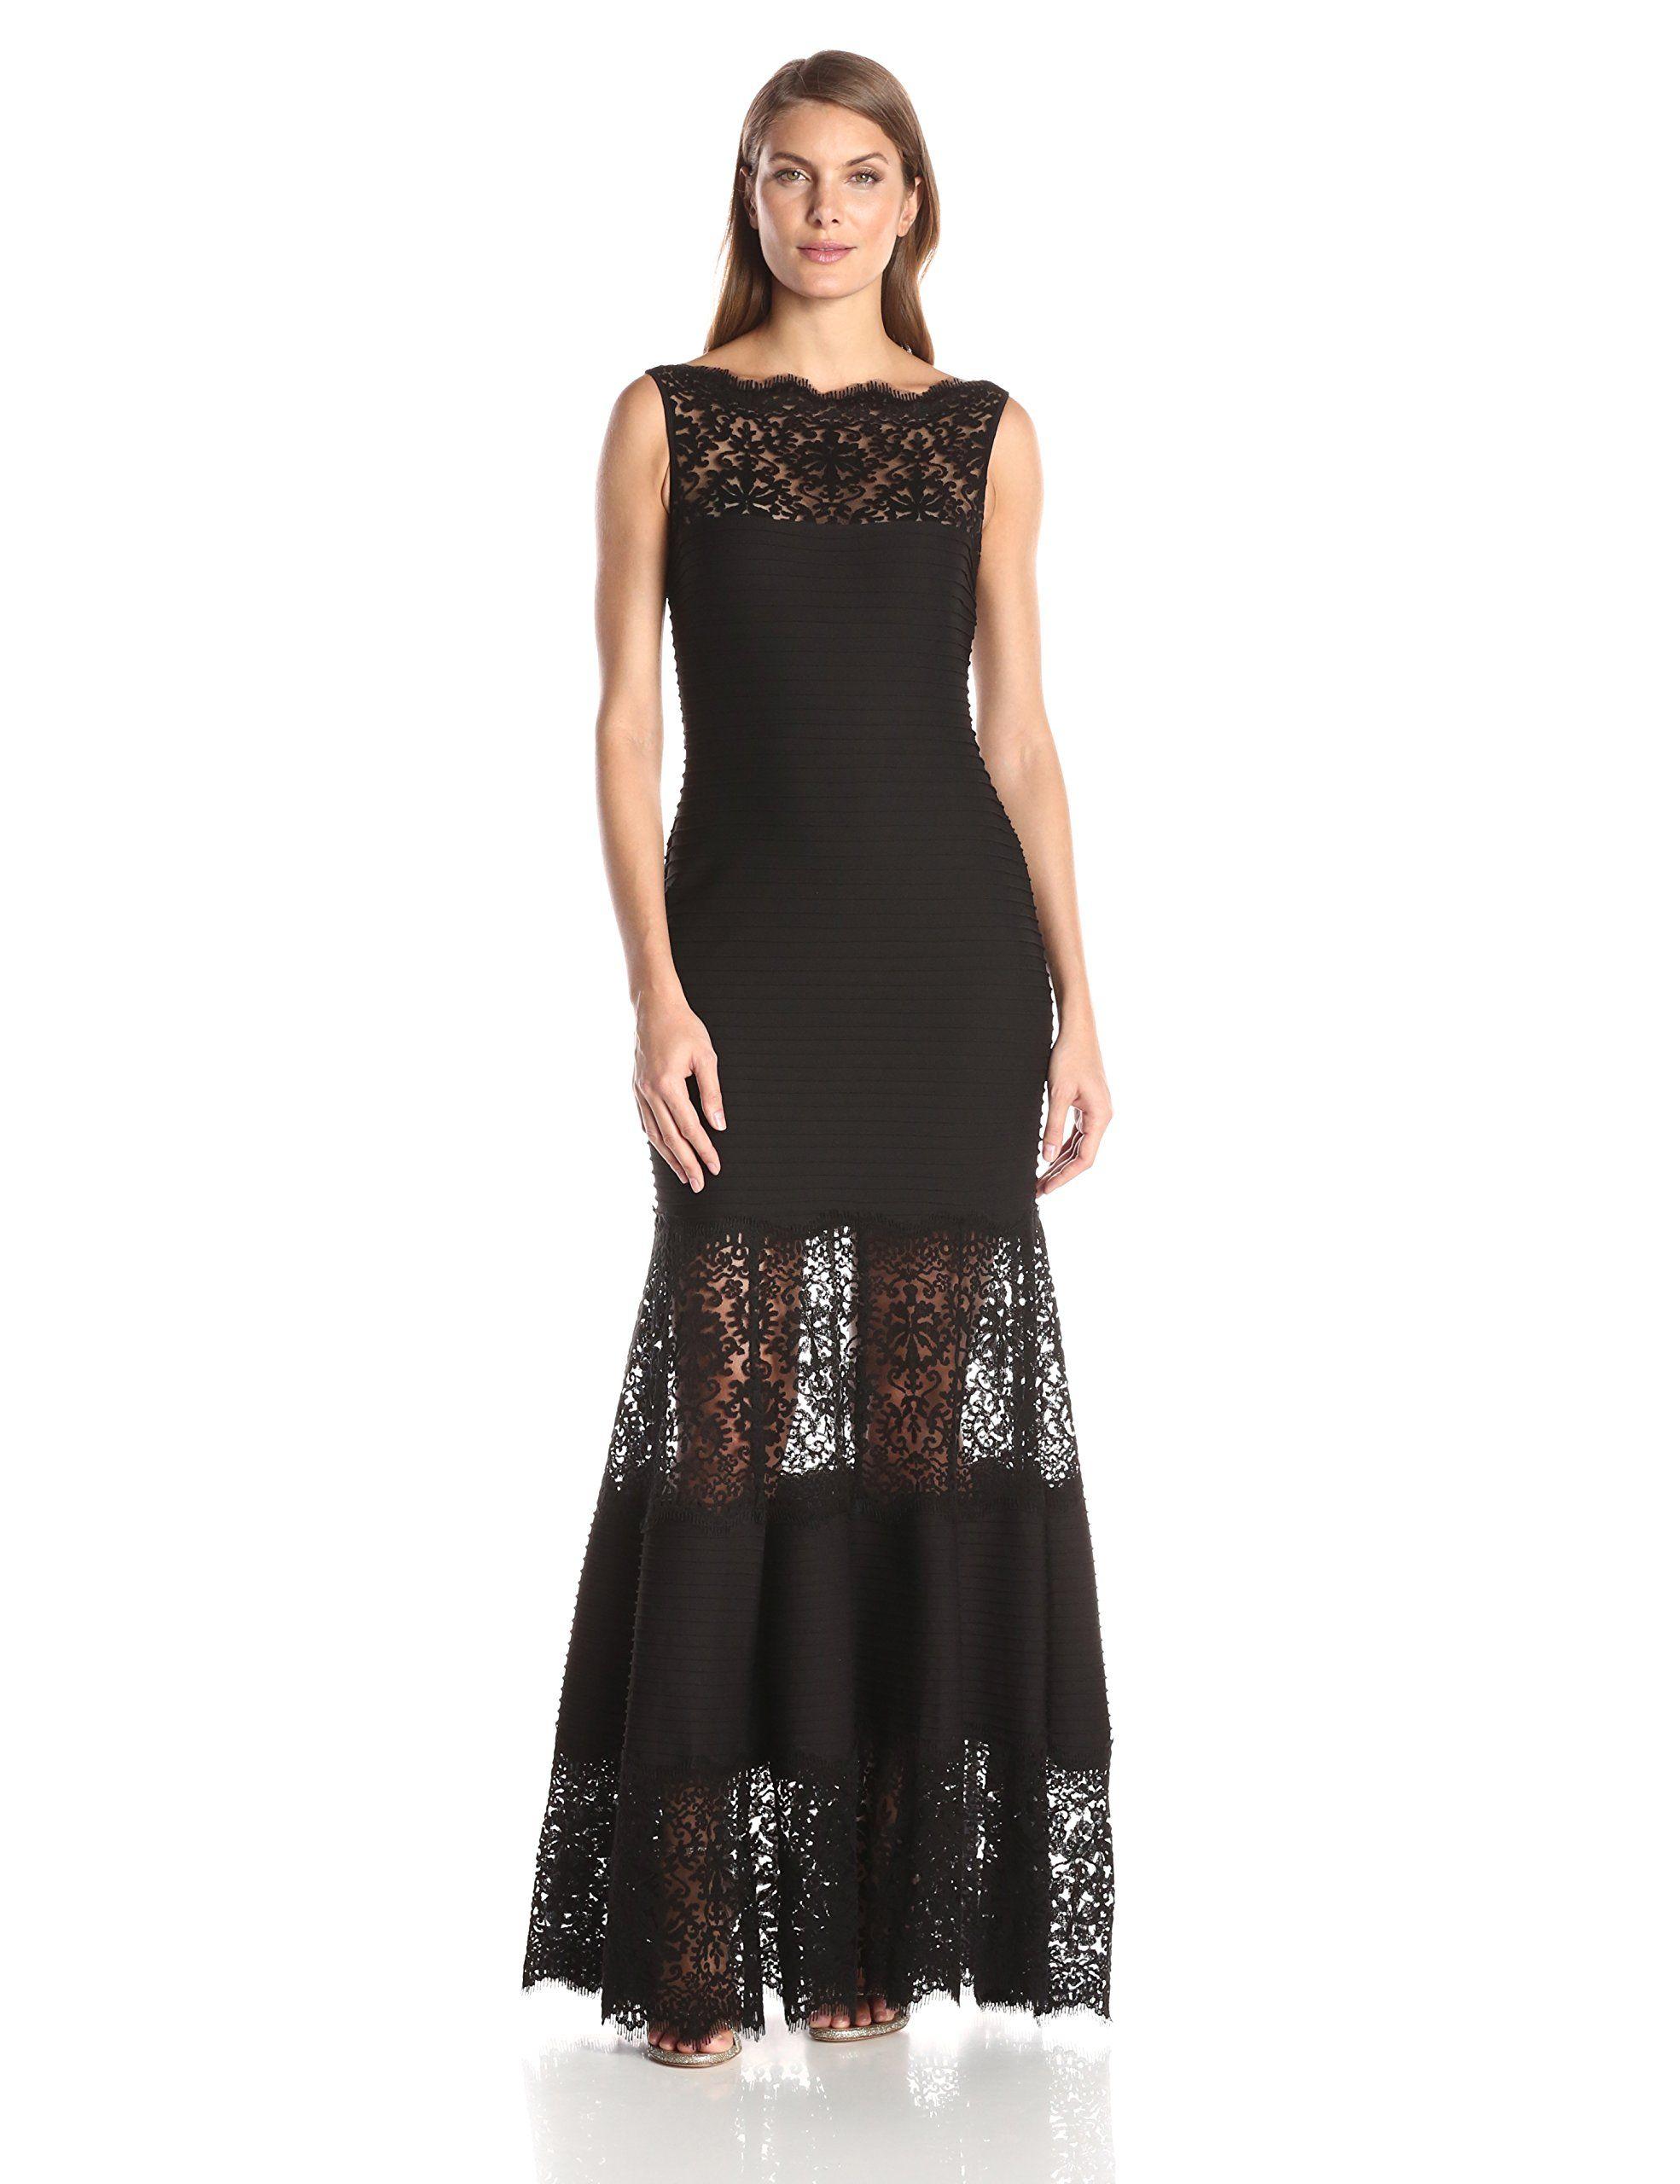 96f6684304 AMAZON Tadashi Shoji Women s Pintucked Jersey Gown with Lace Illusion Neck  Tassara Fonseca PRODUCT PAGE